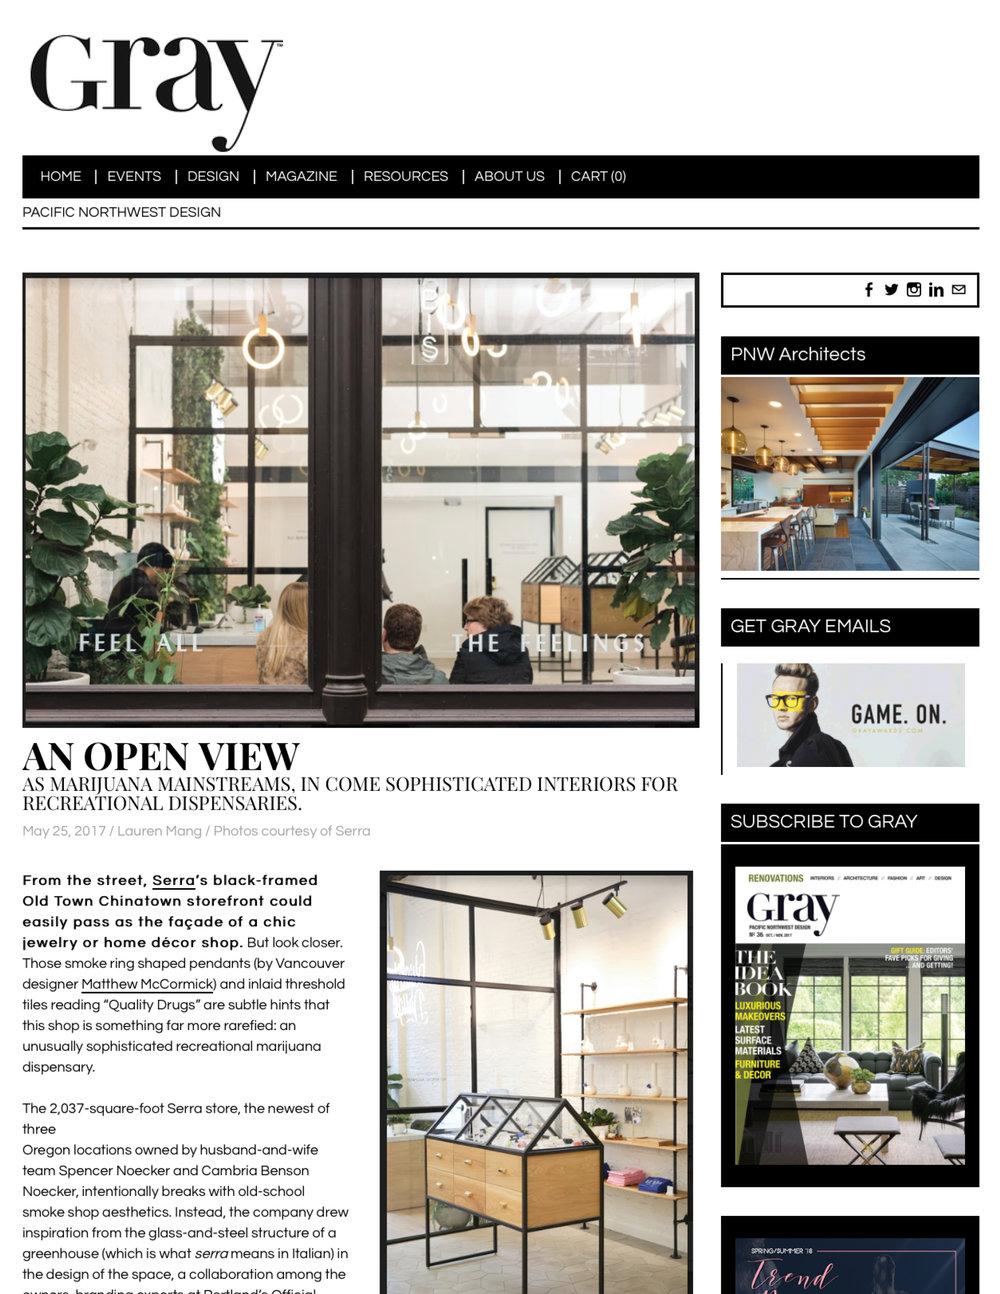 Gray Magazine May 25, 2017